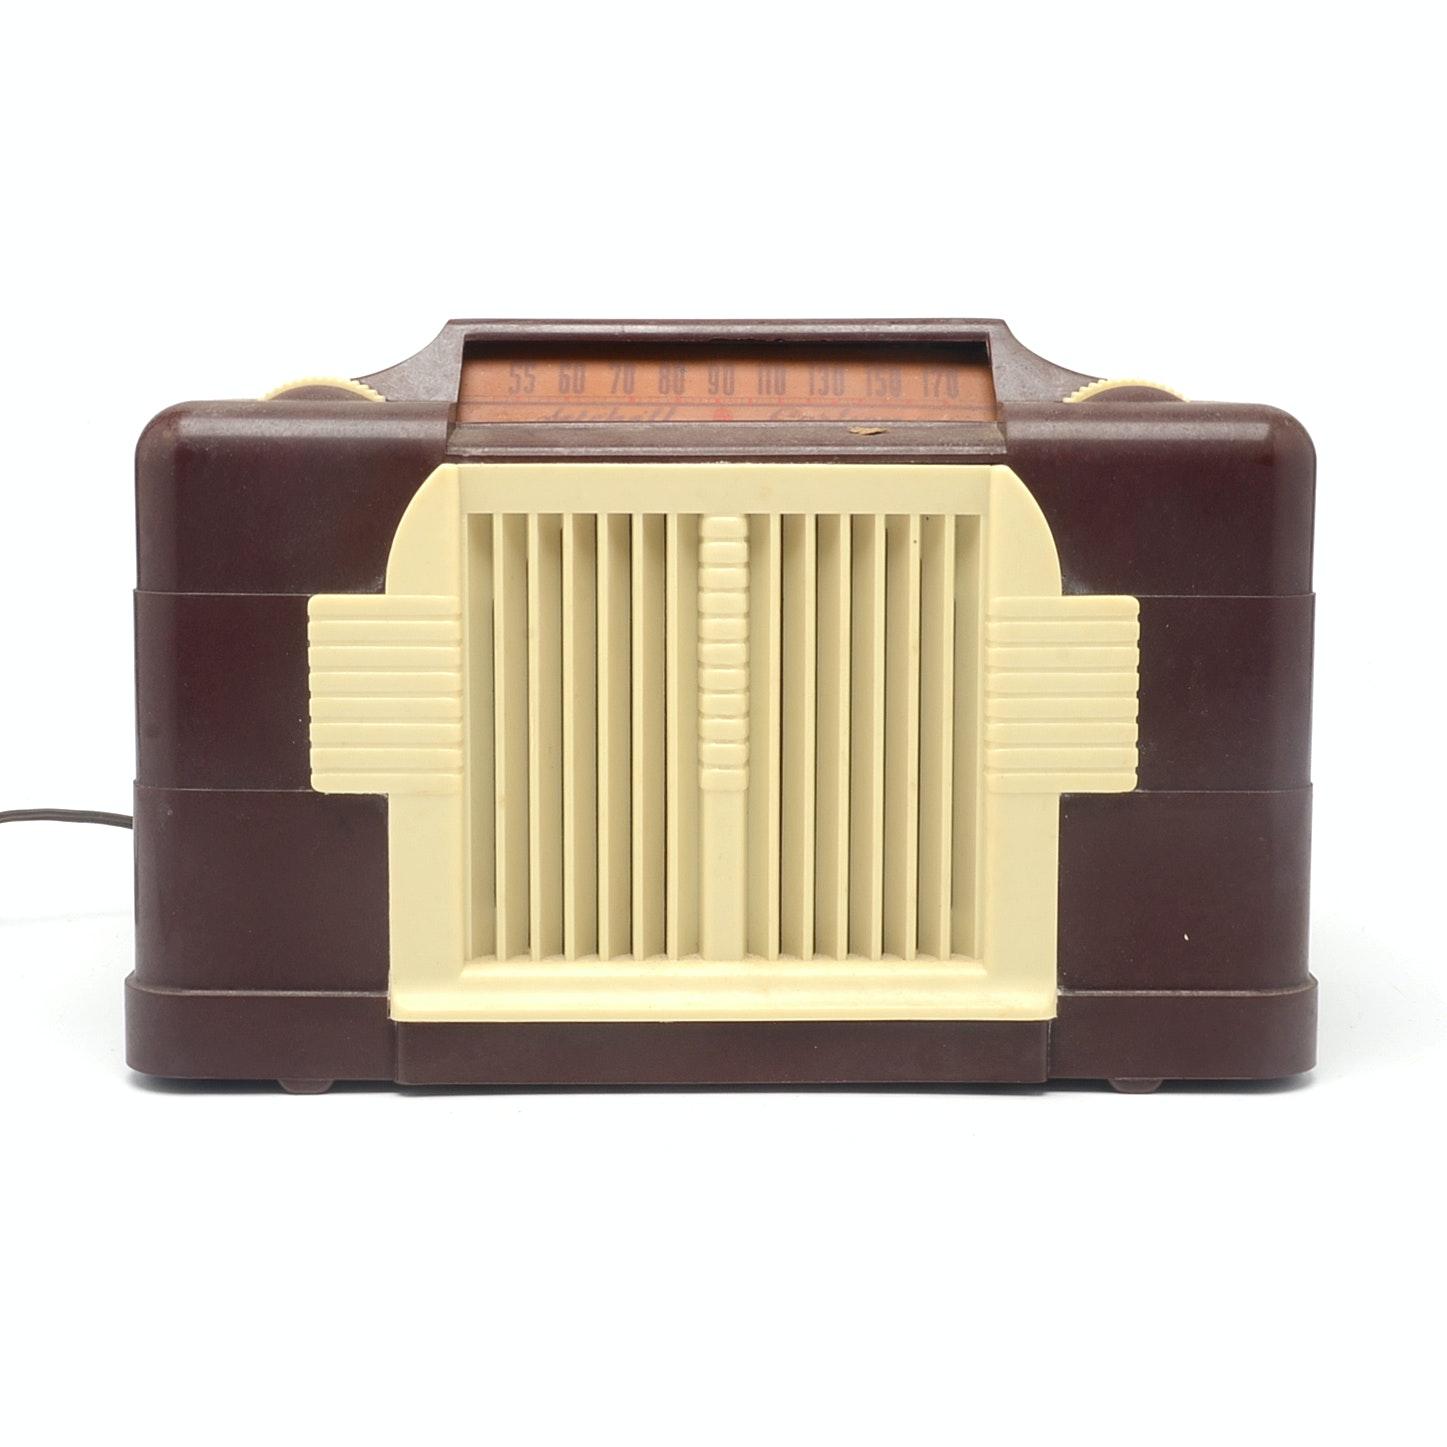 Setchell-Carlson Radio